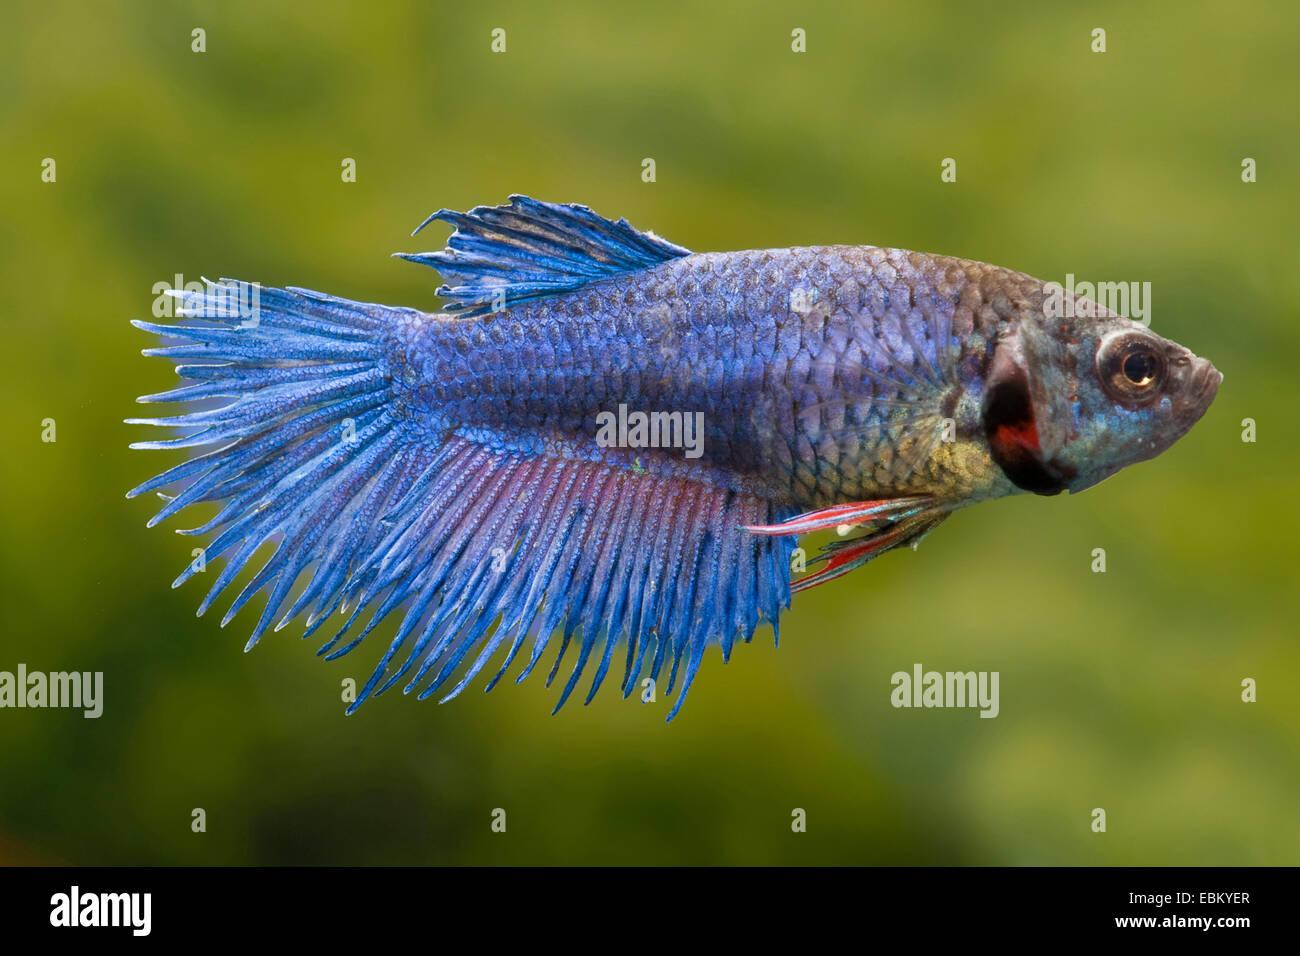 Blue Siamese Fighting Fish Betta Stock Photos & Blue Siamese ...